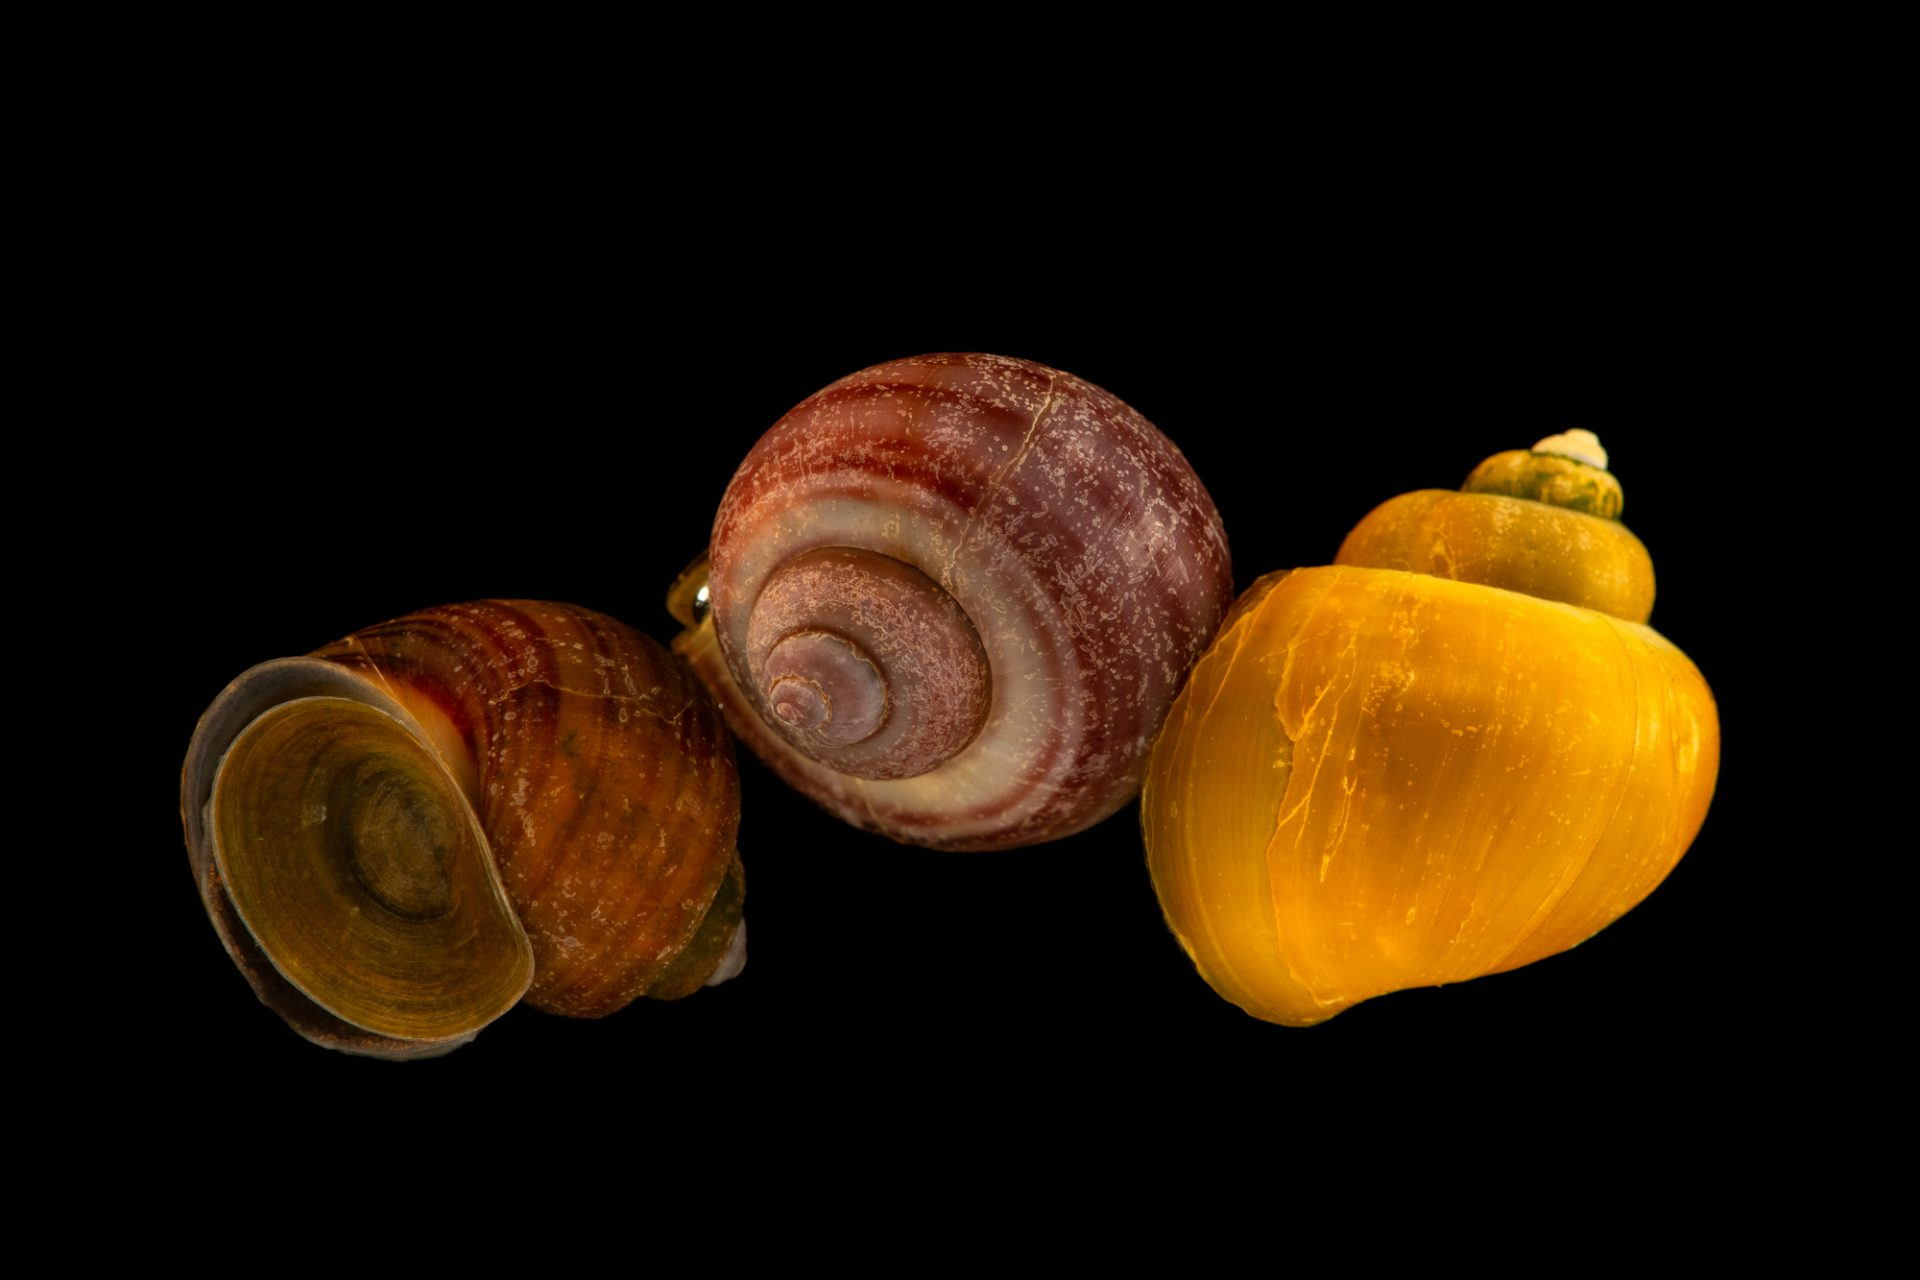 Photo: Spiked-top apple snail or mystery snail (Pomacea bridgesii) at Butterfly Pavilion.